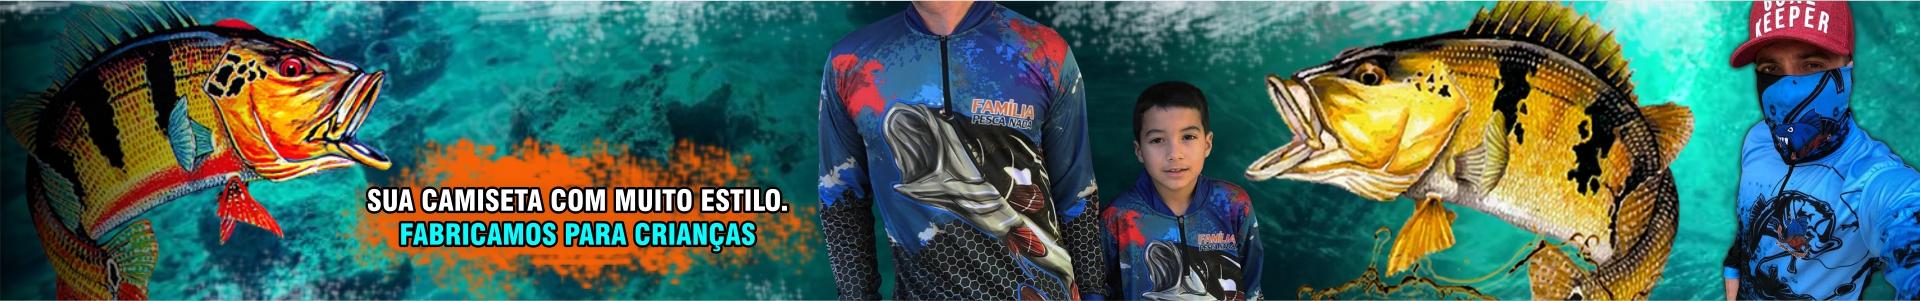 banner-camisa-de-pesca-desktop-02